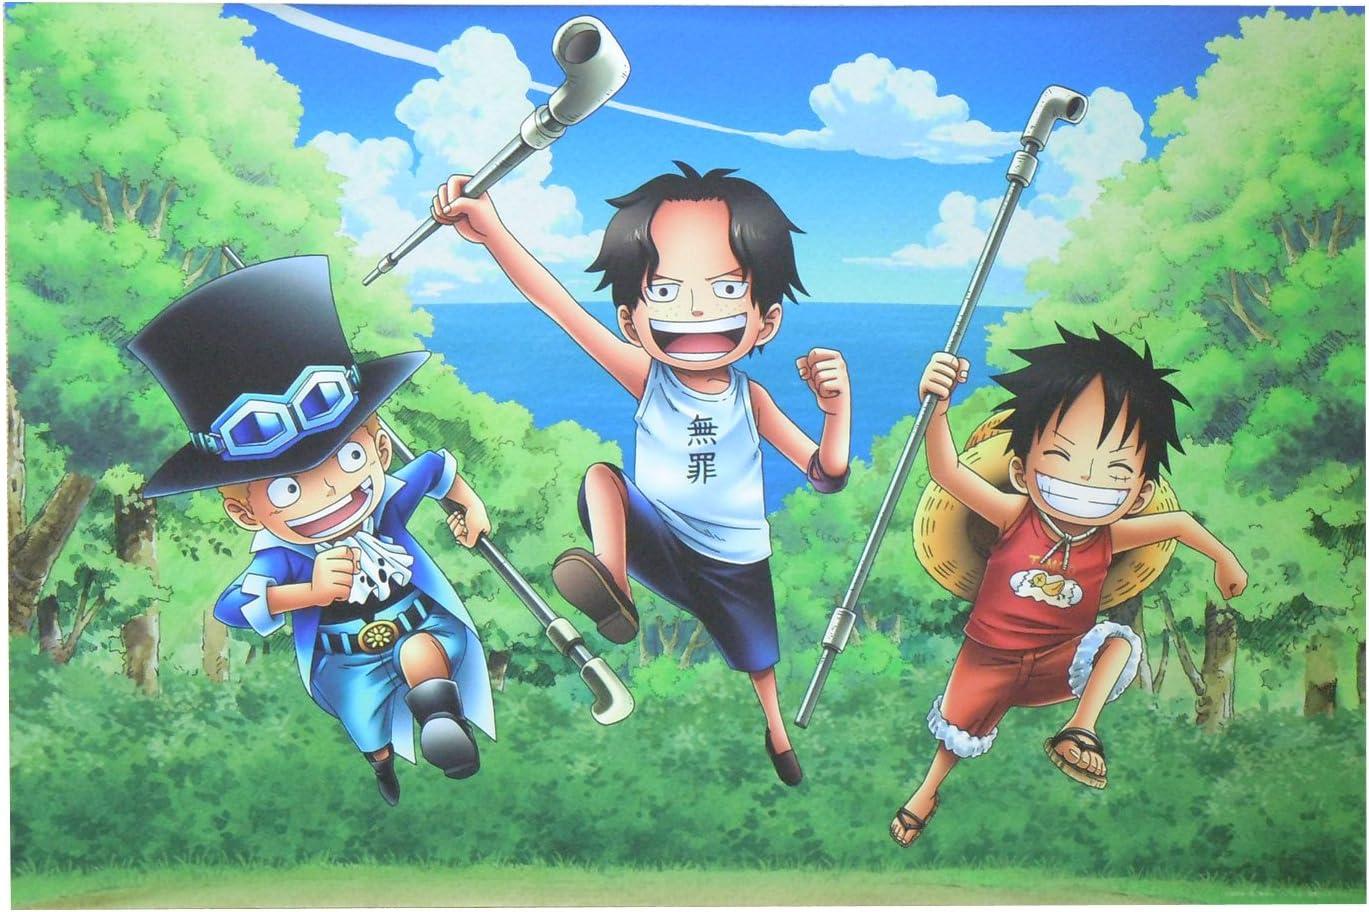 Amazon One Piece ワンピース 壁紙 45cm 67 5cm コルボ山の三兄弟